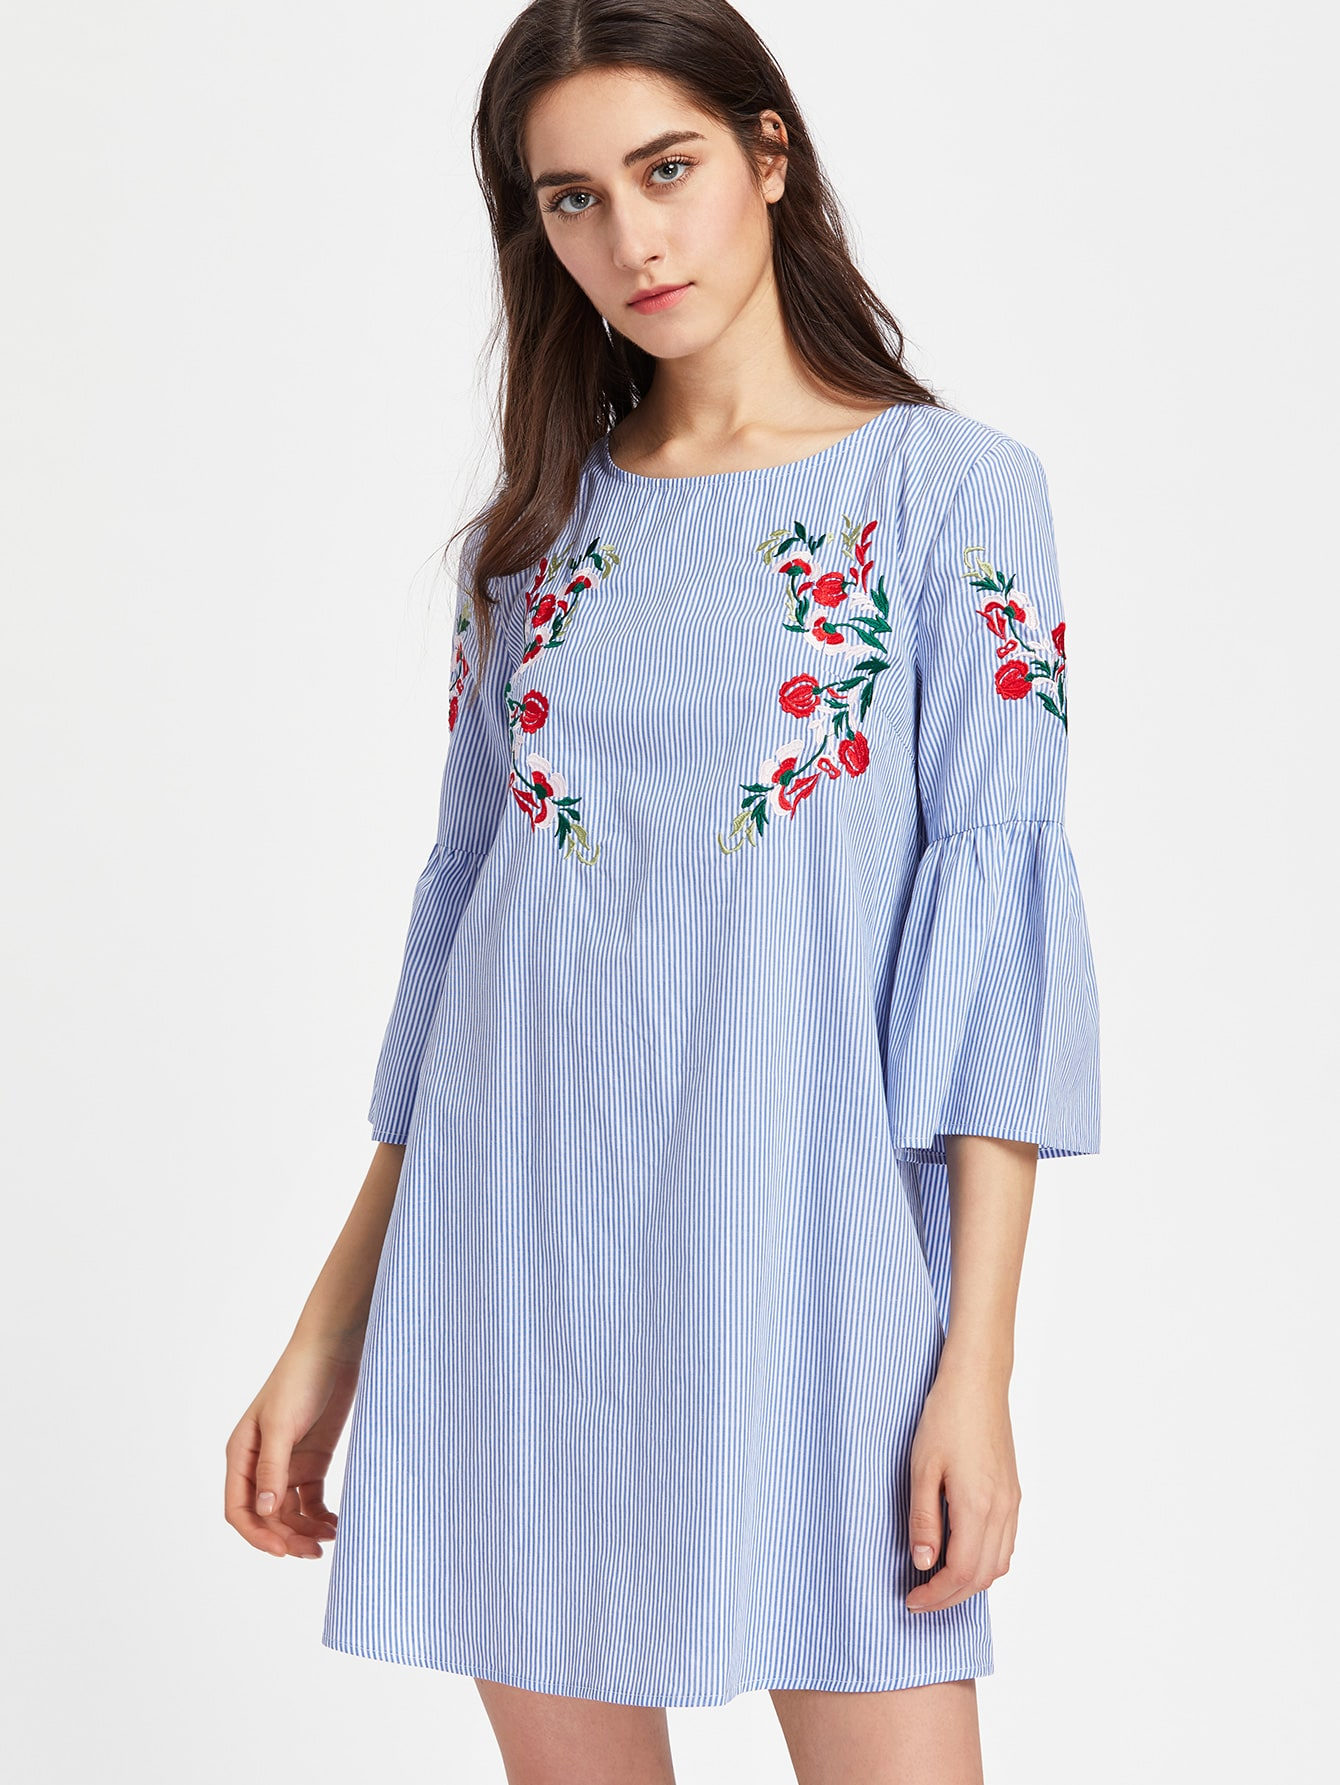 Фото Fluted Sleeve Blossom Embroidered Striped Dress. Купить с доставкой